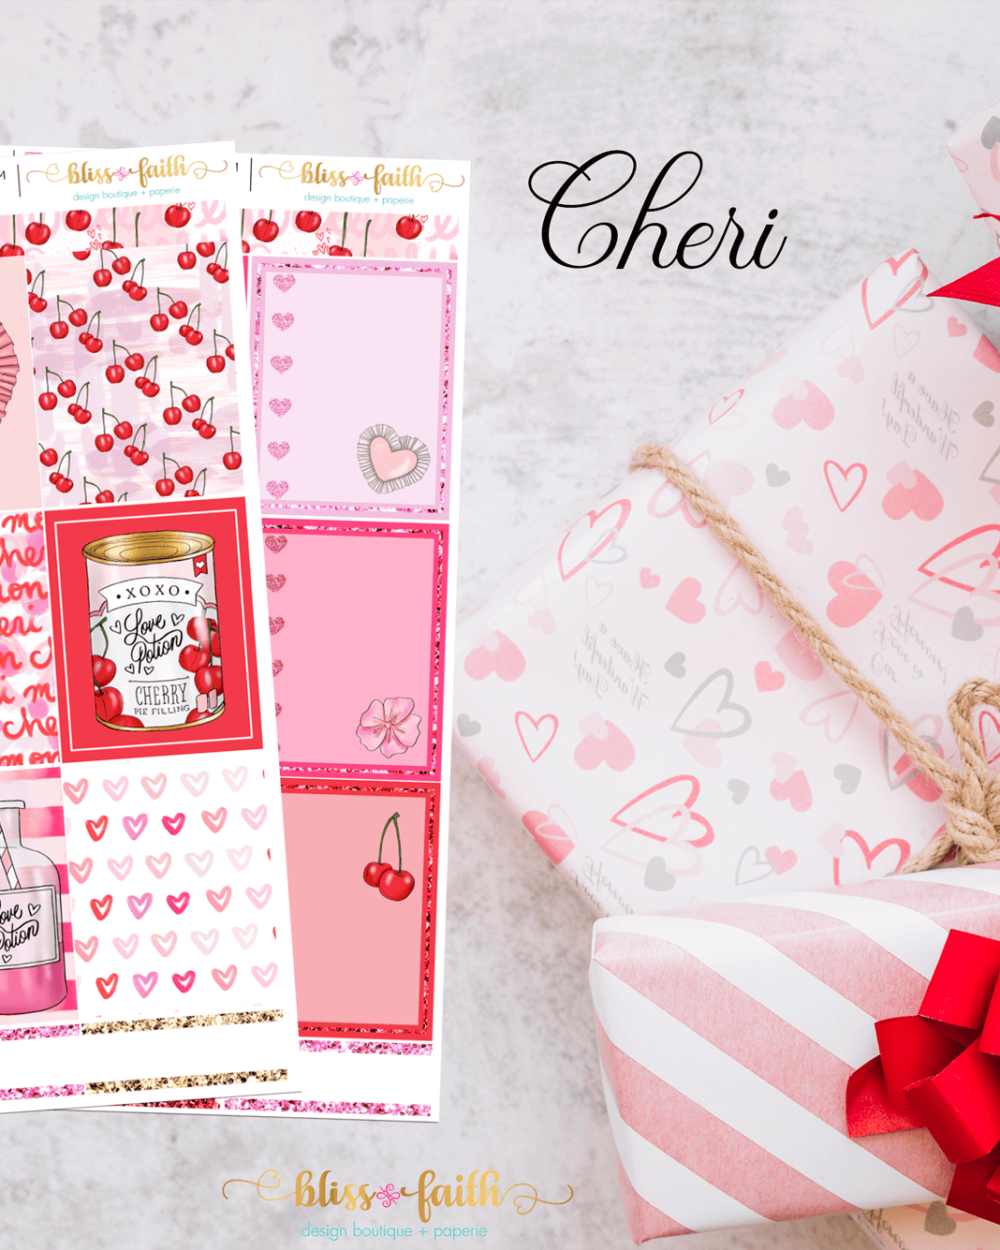 Cheri Weekly Sticker Kit | blissandfaith.com